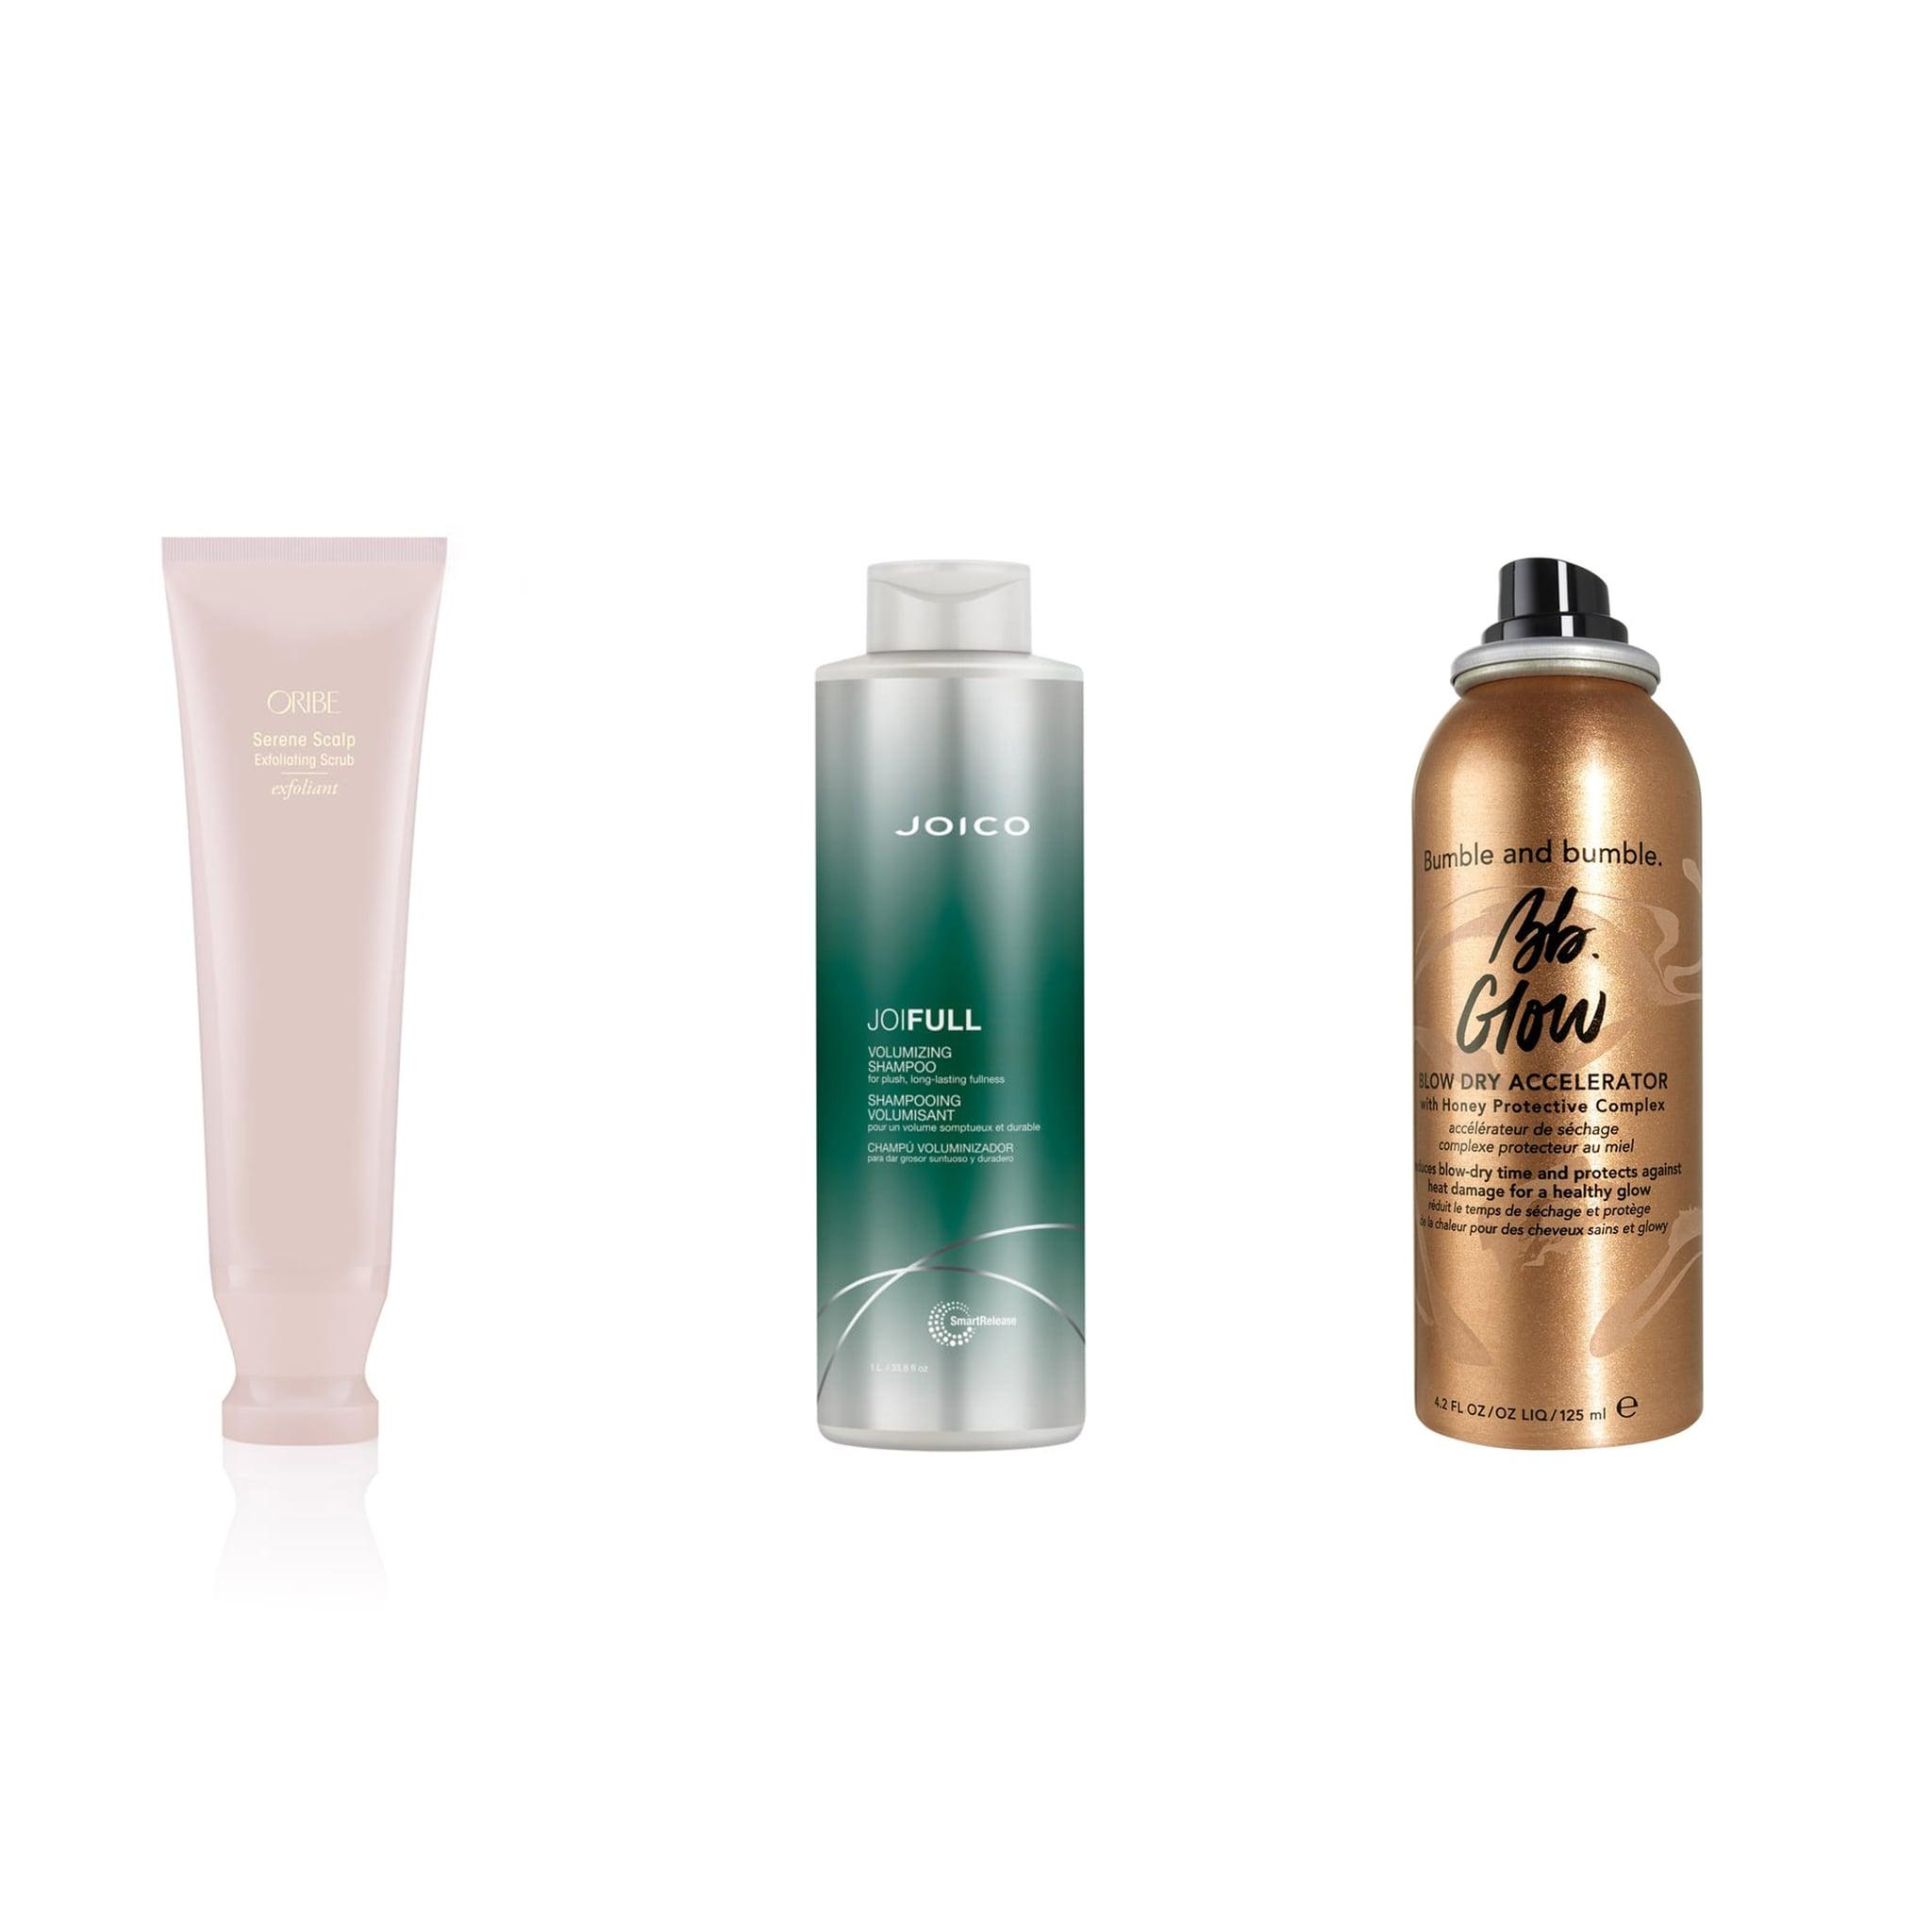 Oribe Serene Scalp Exfoliating Scrub | Best Hair Products